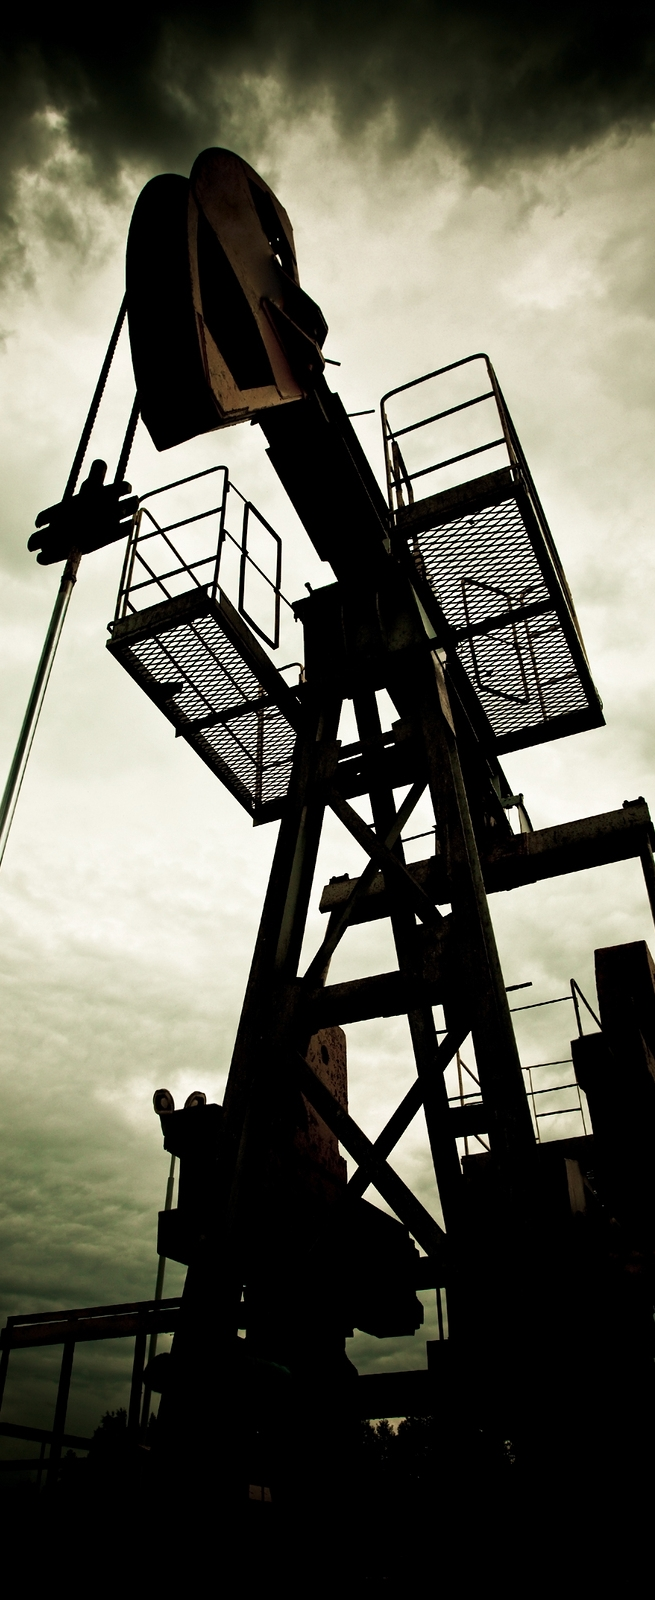 bigstock-Oil-Pump-In-The-Field-5617697.jpg